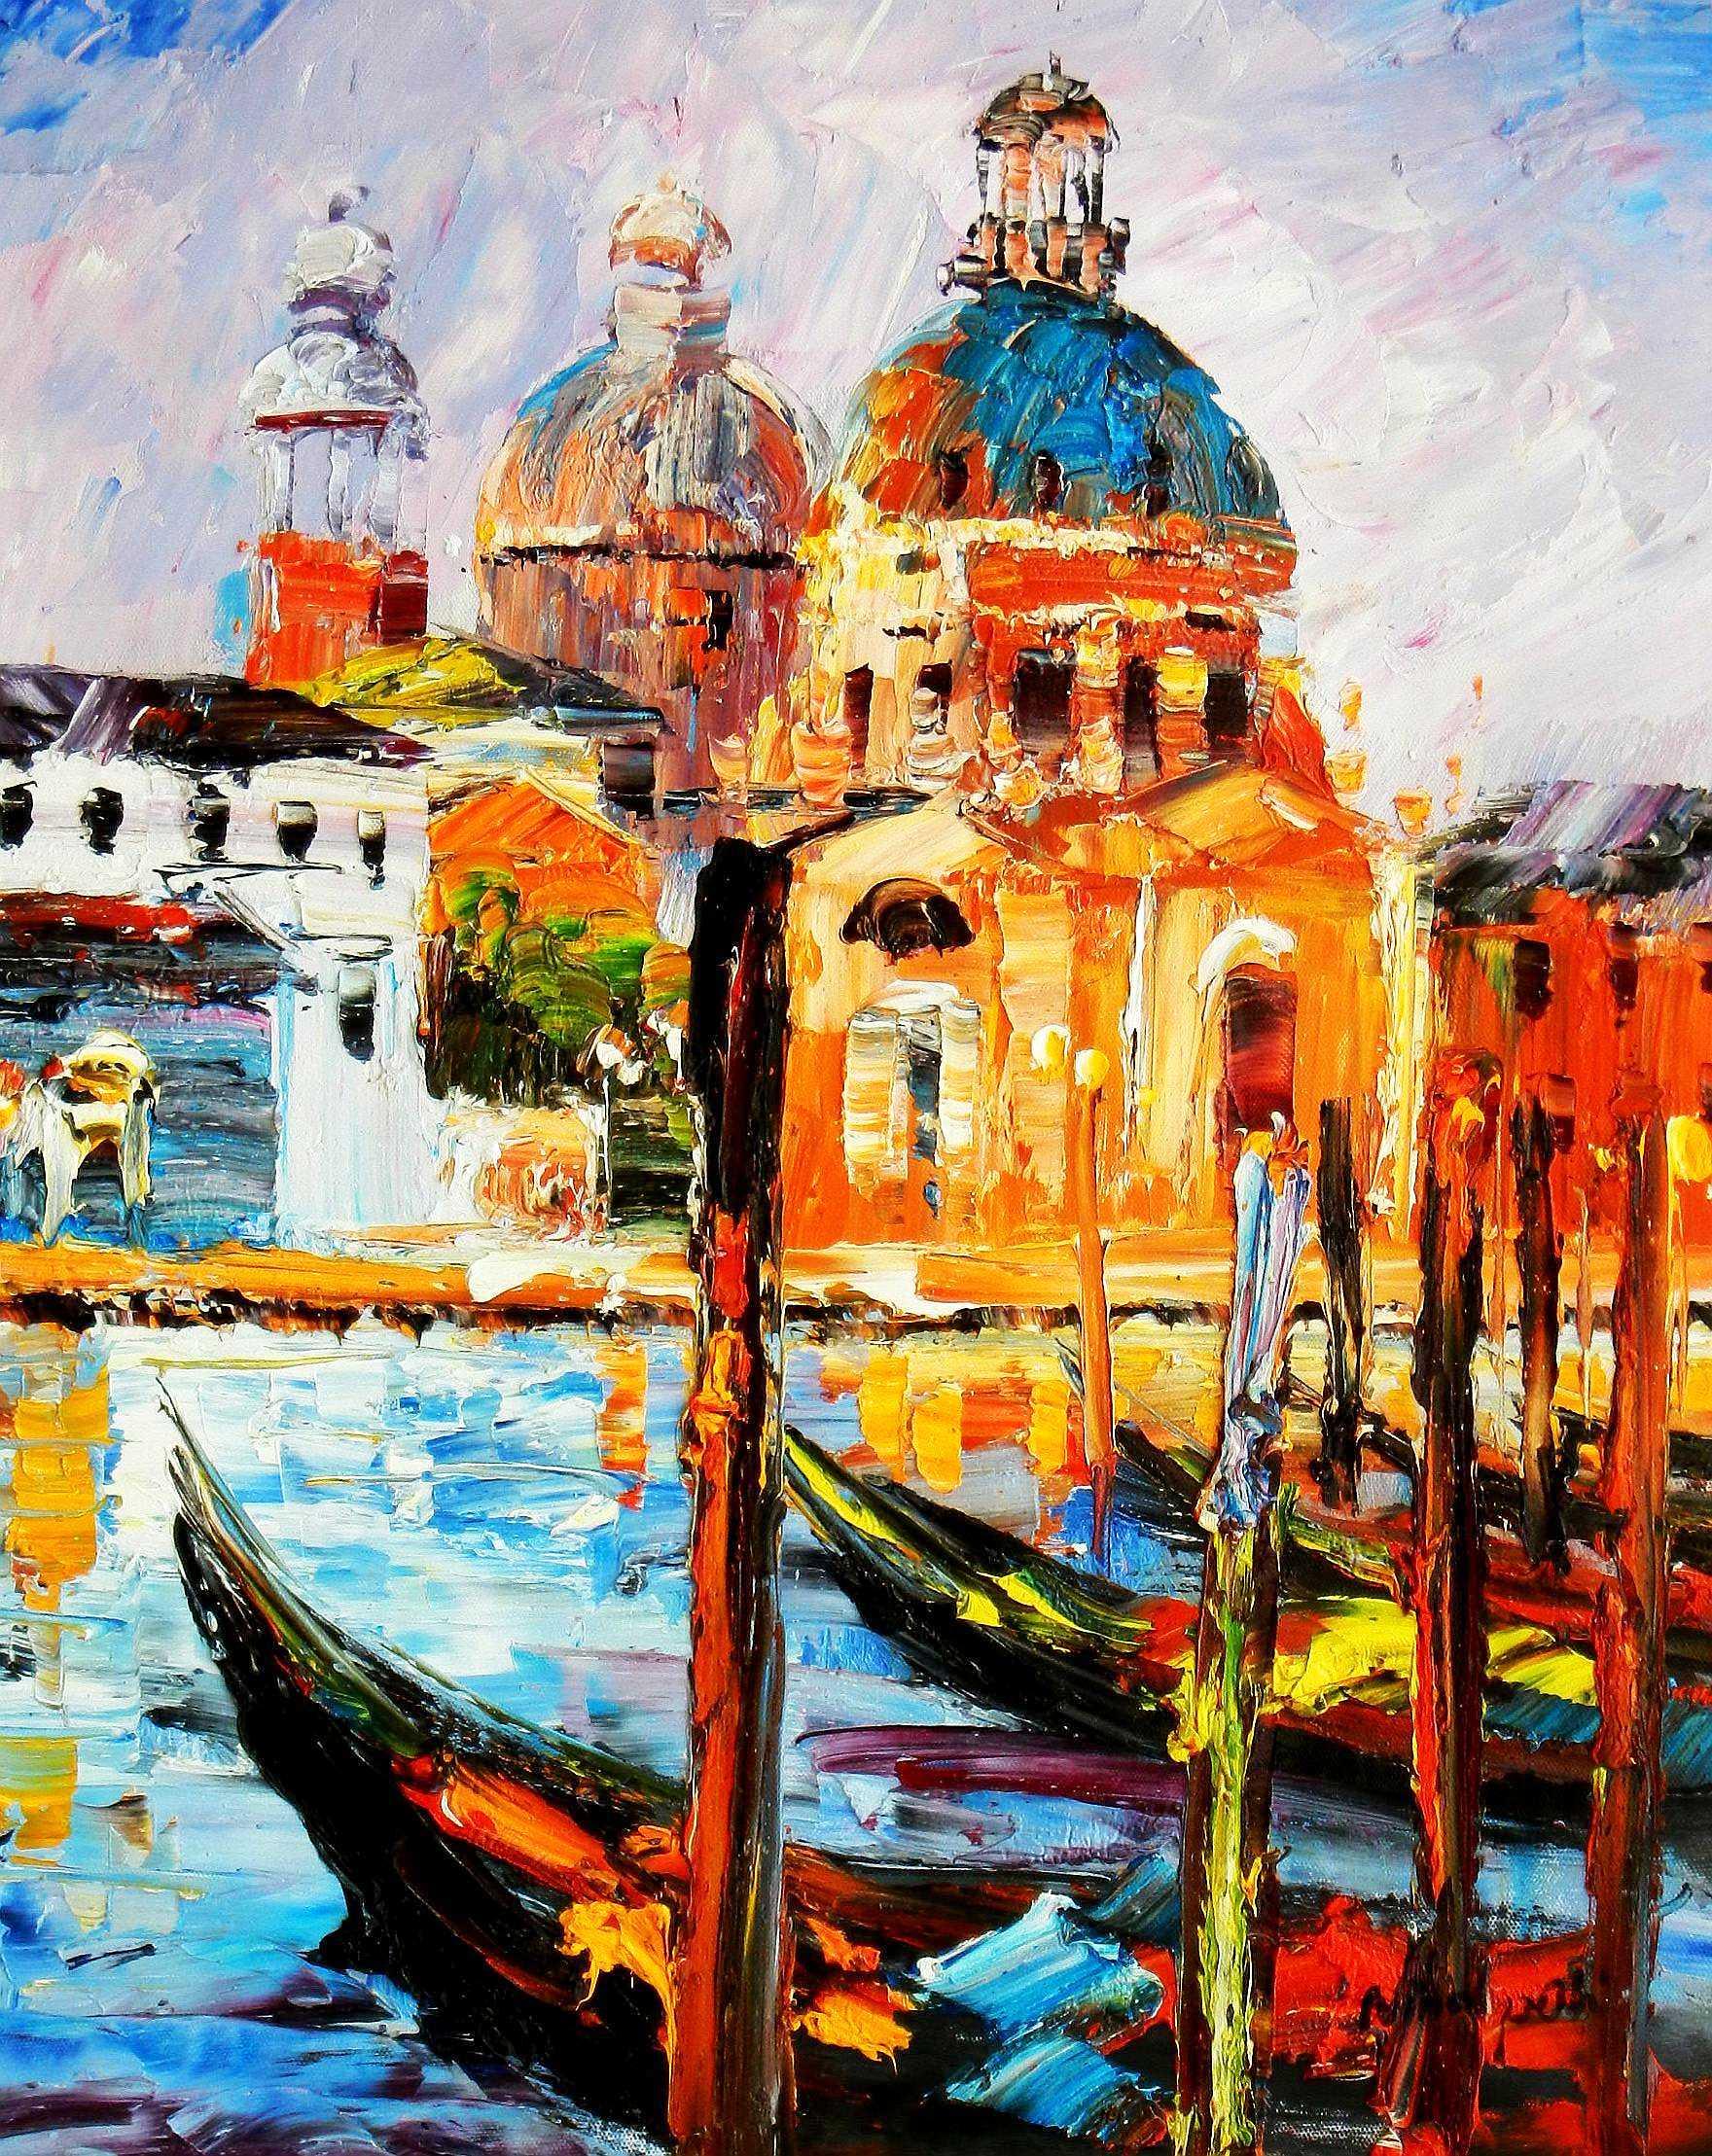 Modern Art - Venedig Canale Grande b94794 40x50cm handgemaltes Gemälde